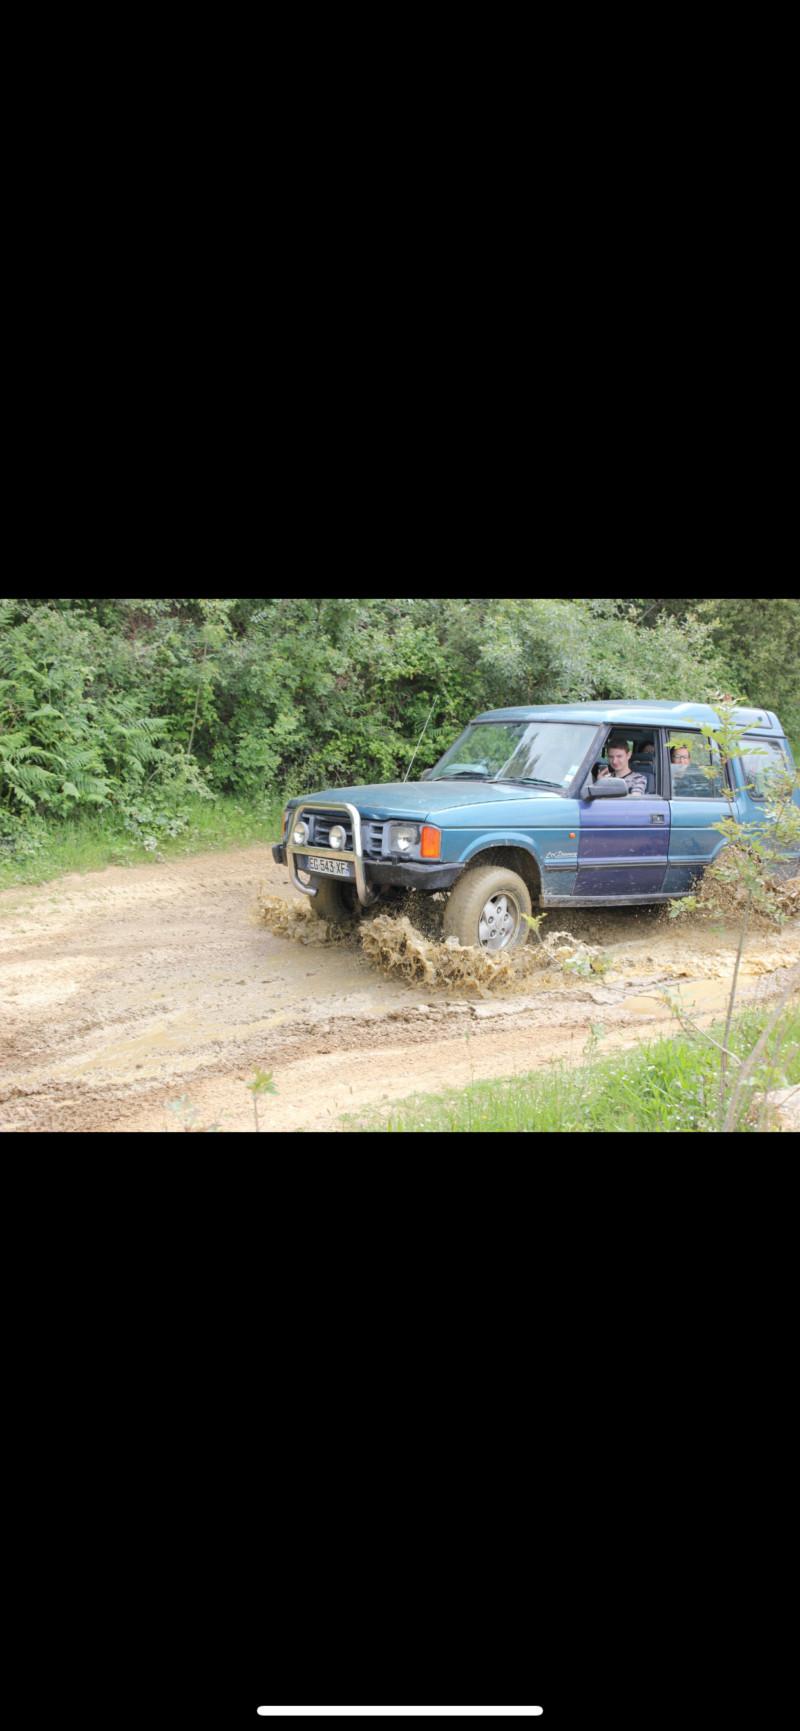 Le Land Rover Discovery 200 TDI de Noel85 15590211